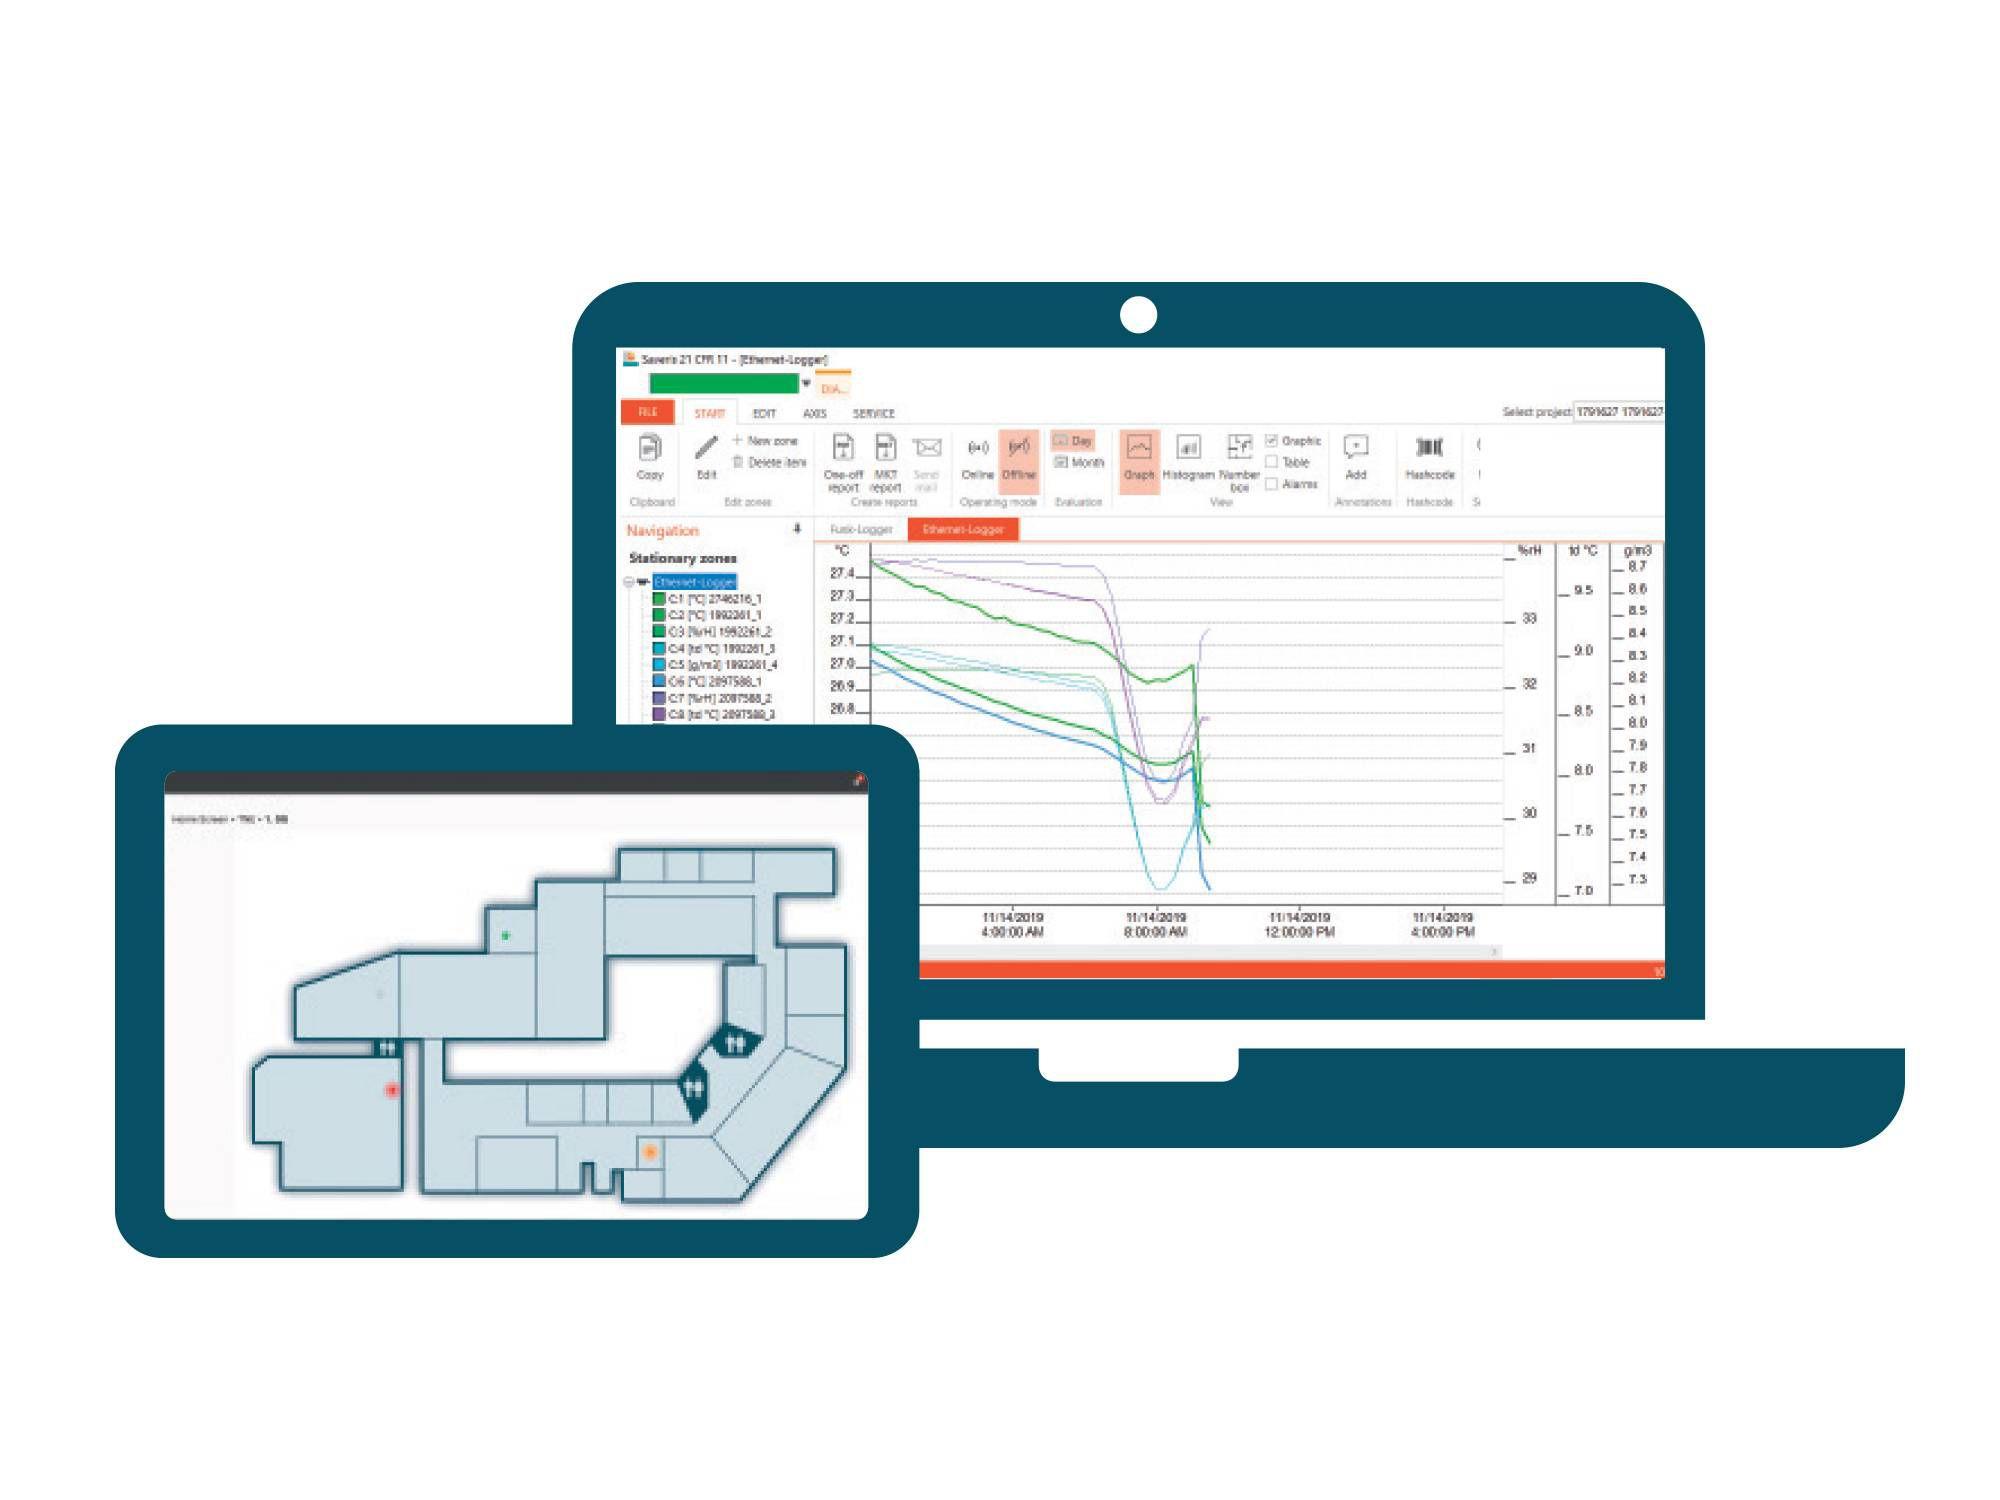 testo Saveris 生命科学环境监测系统——软件